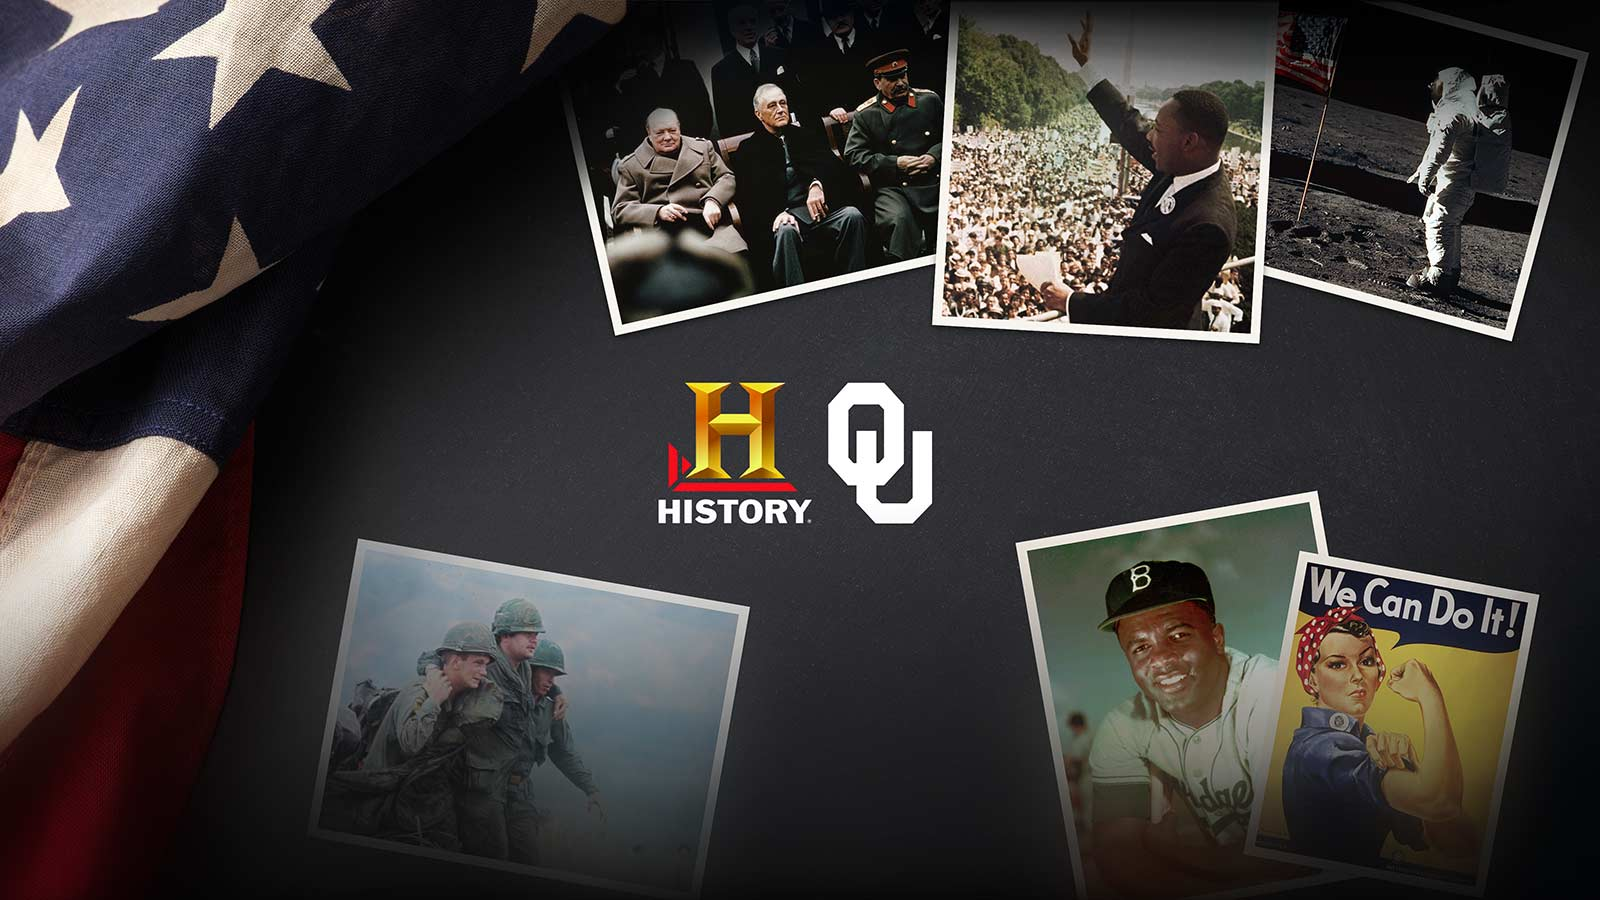 HISTORY_OU_news_2b